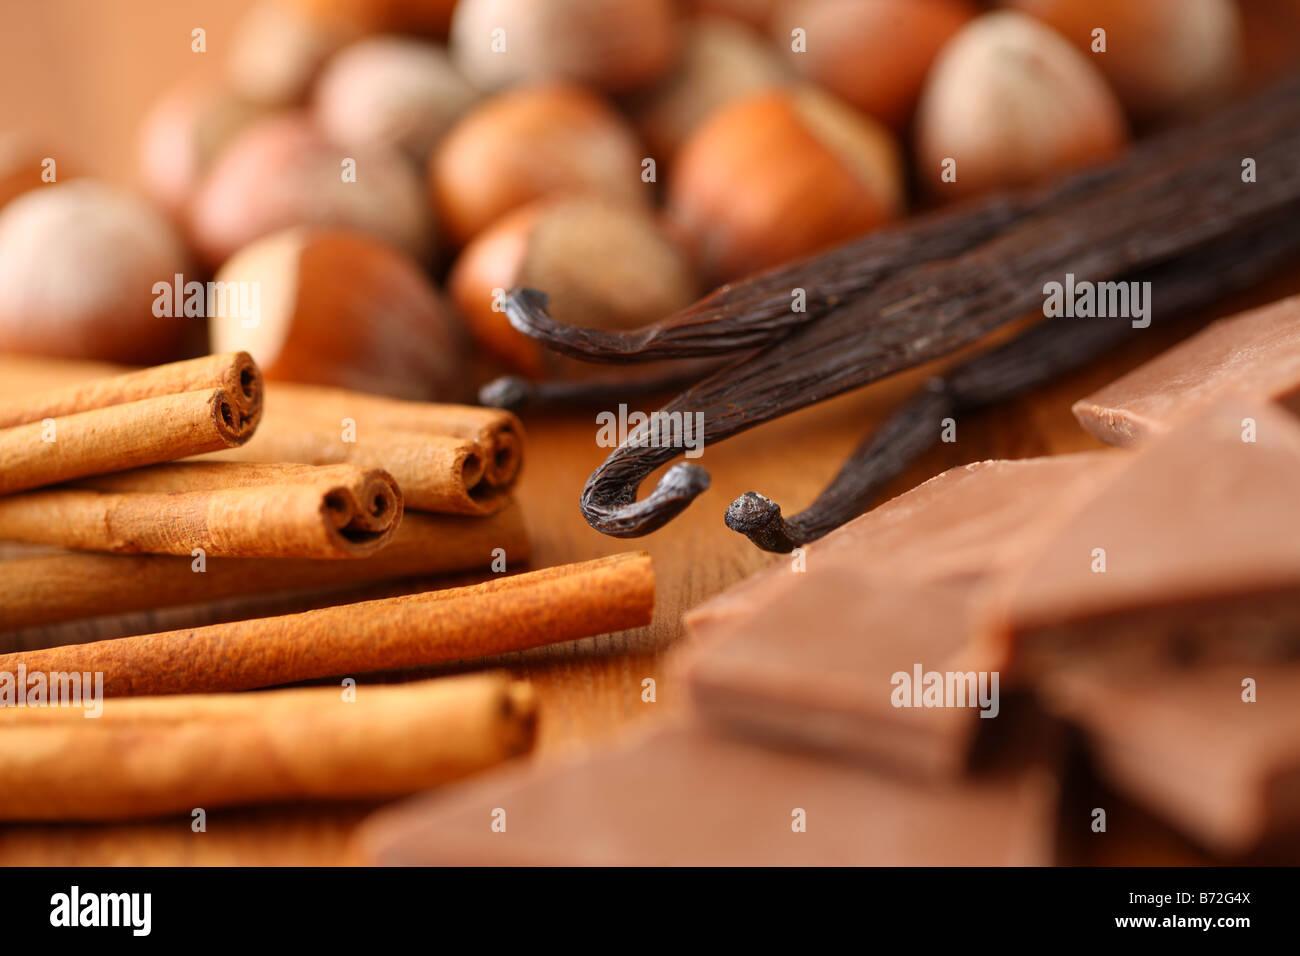 Hazelnuts Cinnamon Sticks Vanilla Beans and Chocolate - Stock Image